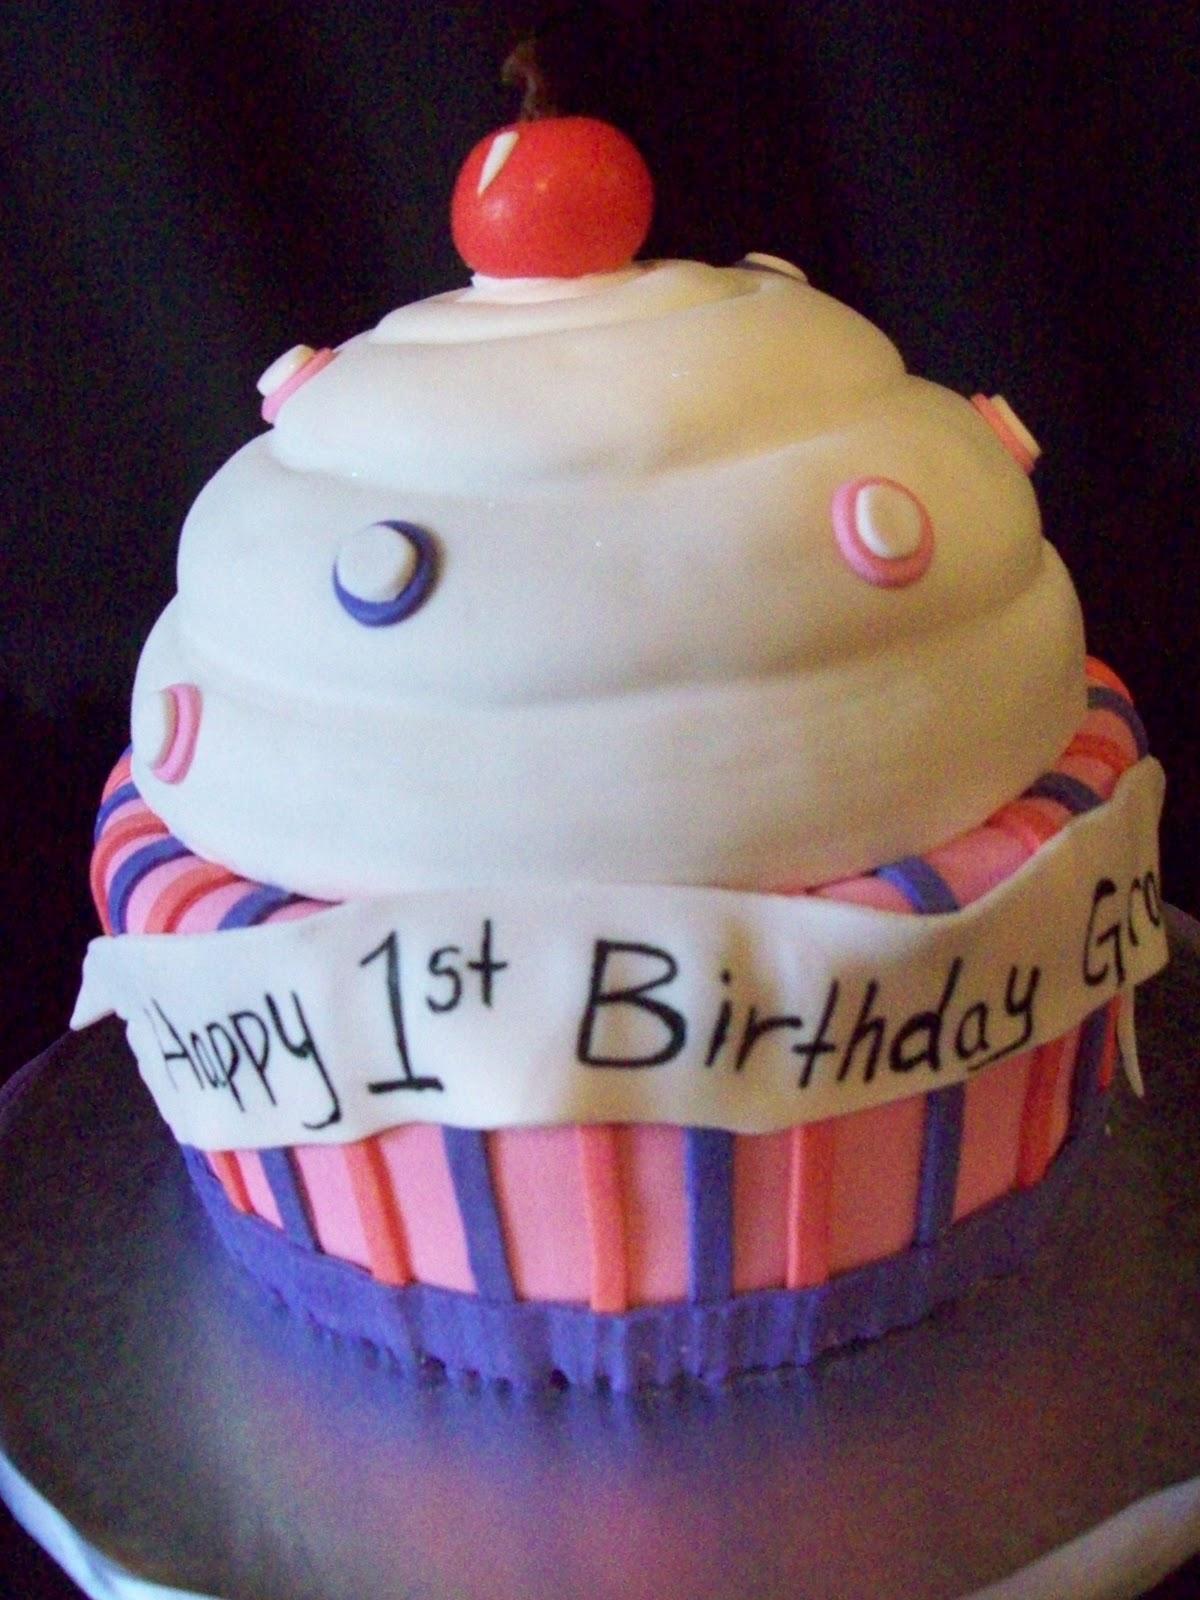 Brown Sugar Custom Cakes: First Birthday Cake